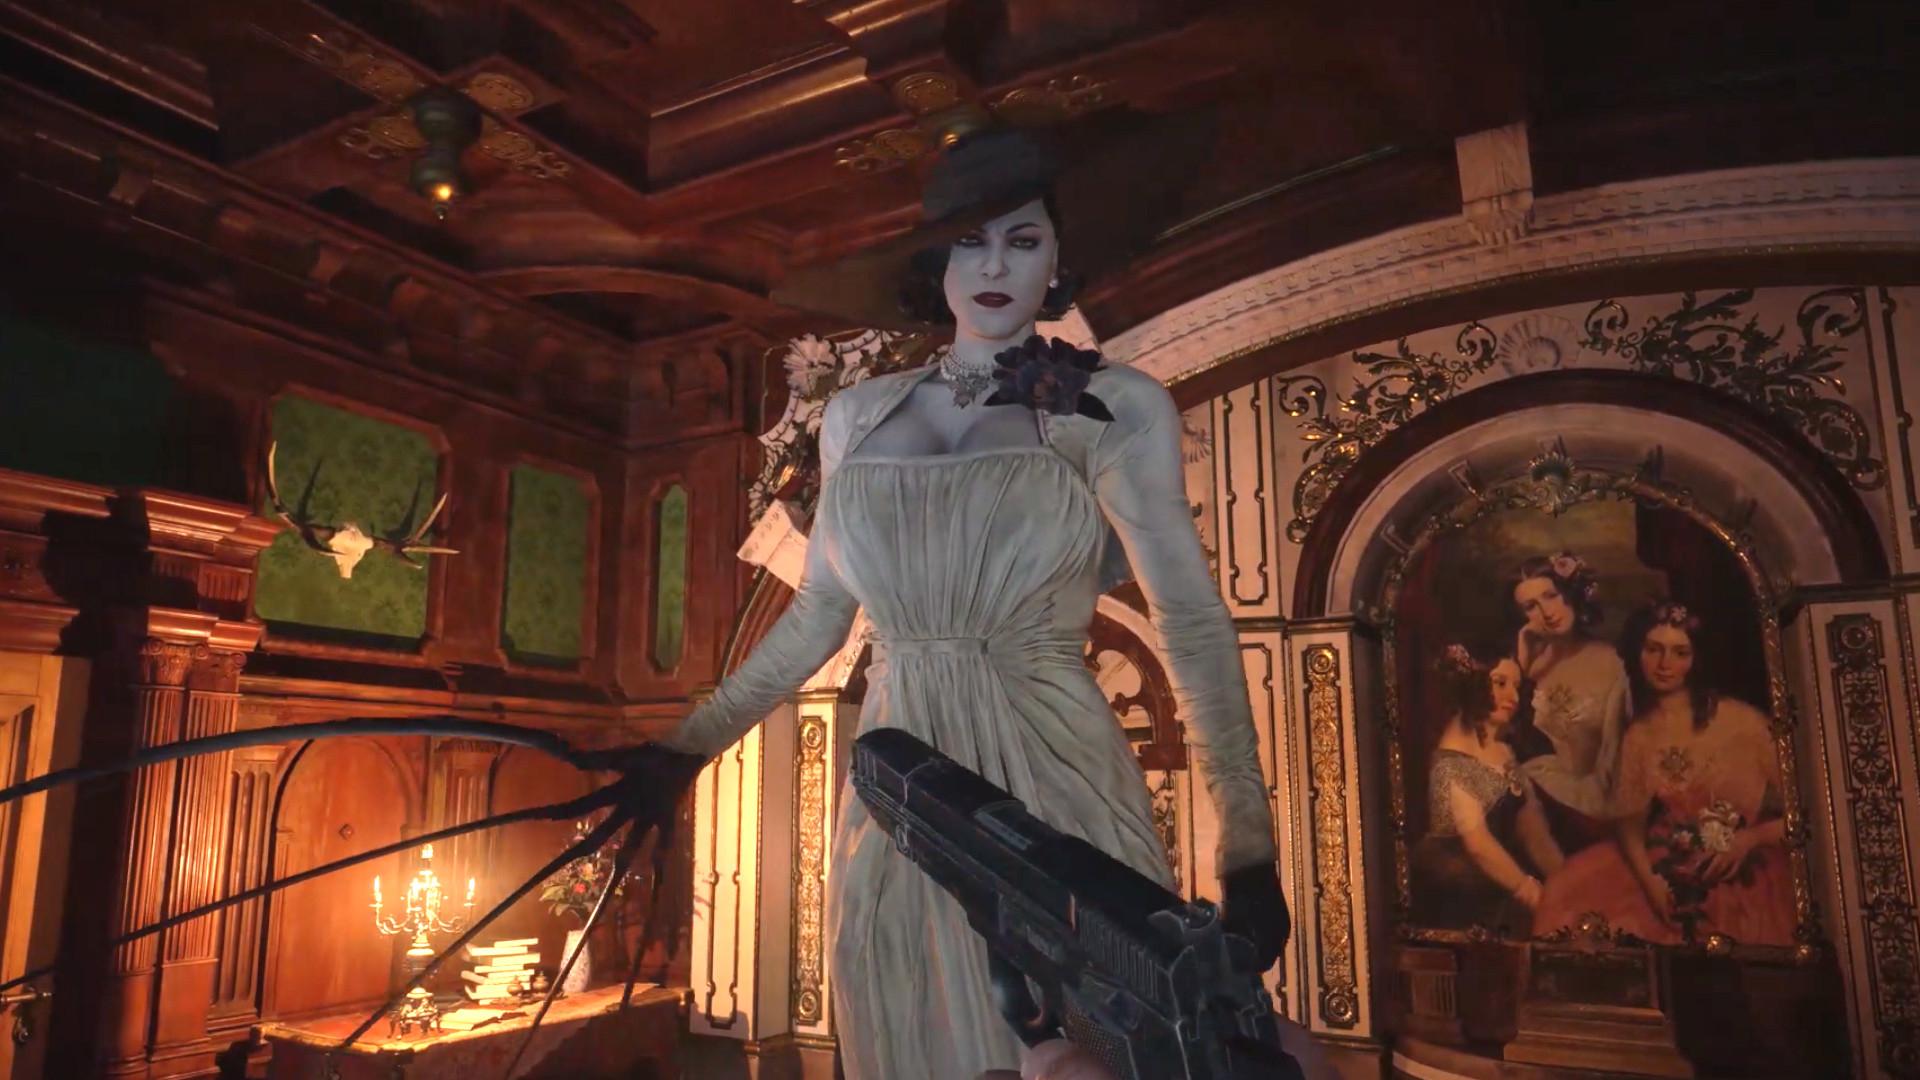 Видео: блогер сравнил графику в демоверсии Resident Evil Village на ПК, PS5, Xbox Series X и в Stadia